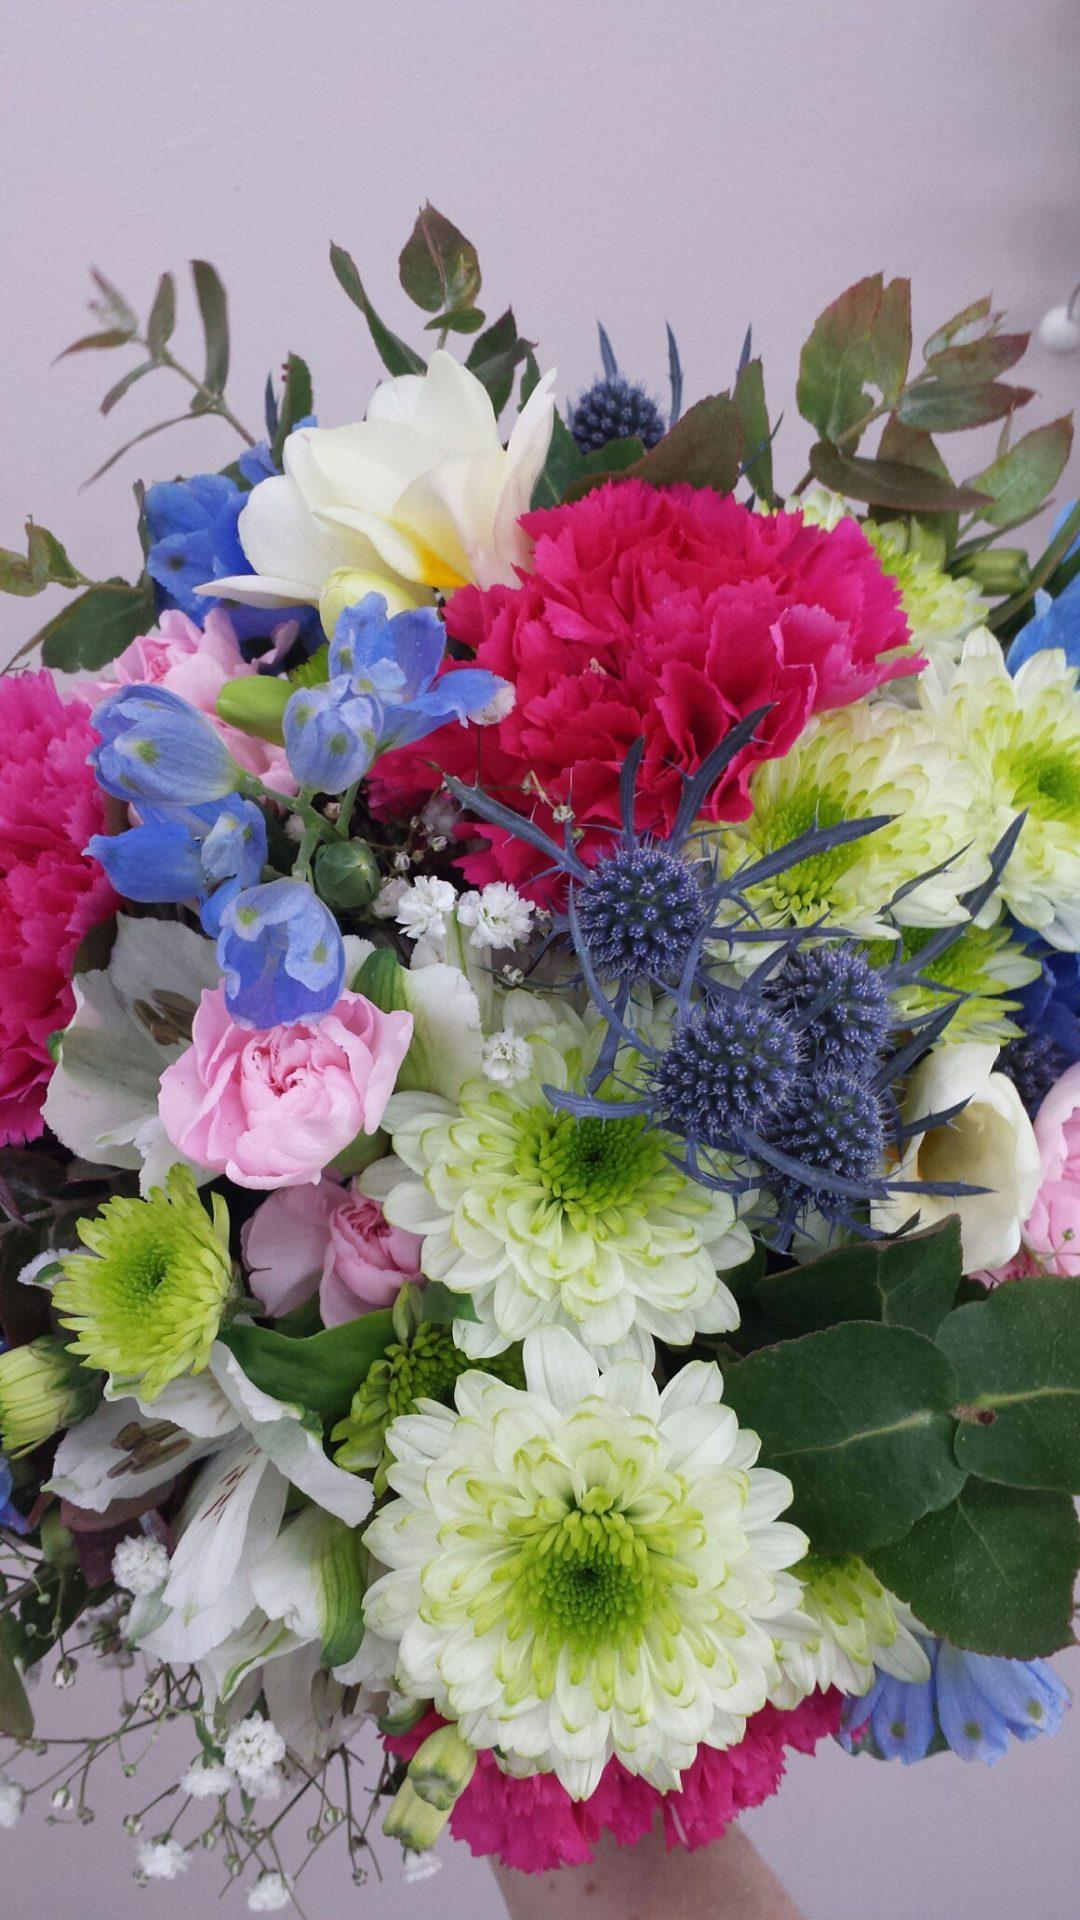 garden-style-daisy-seaholly-roses-gyp-and-delphinium